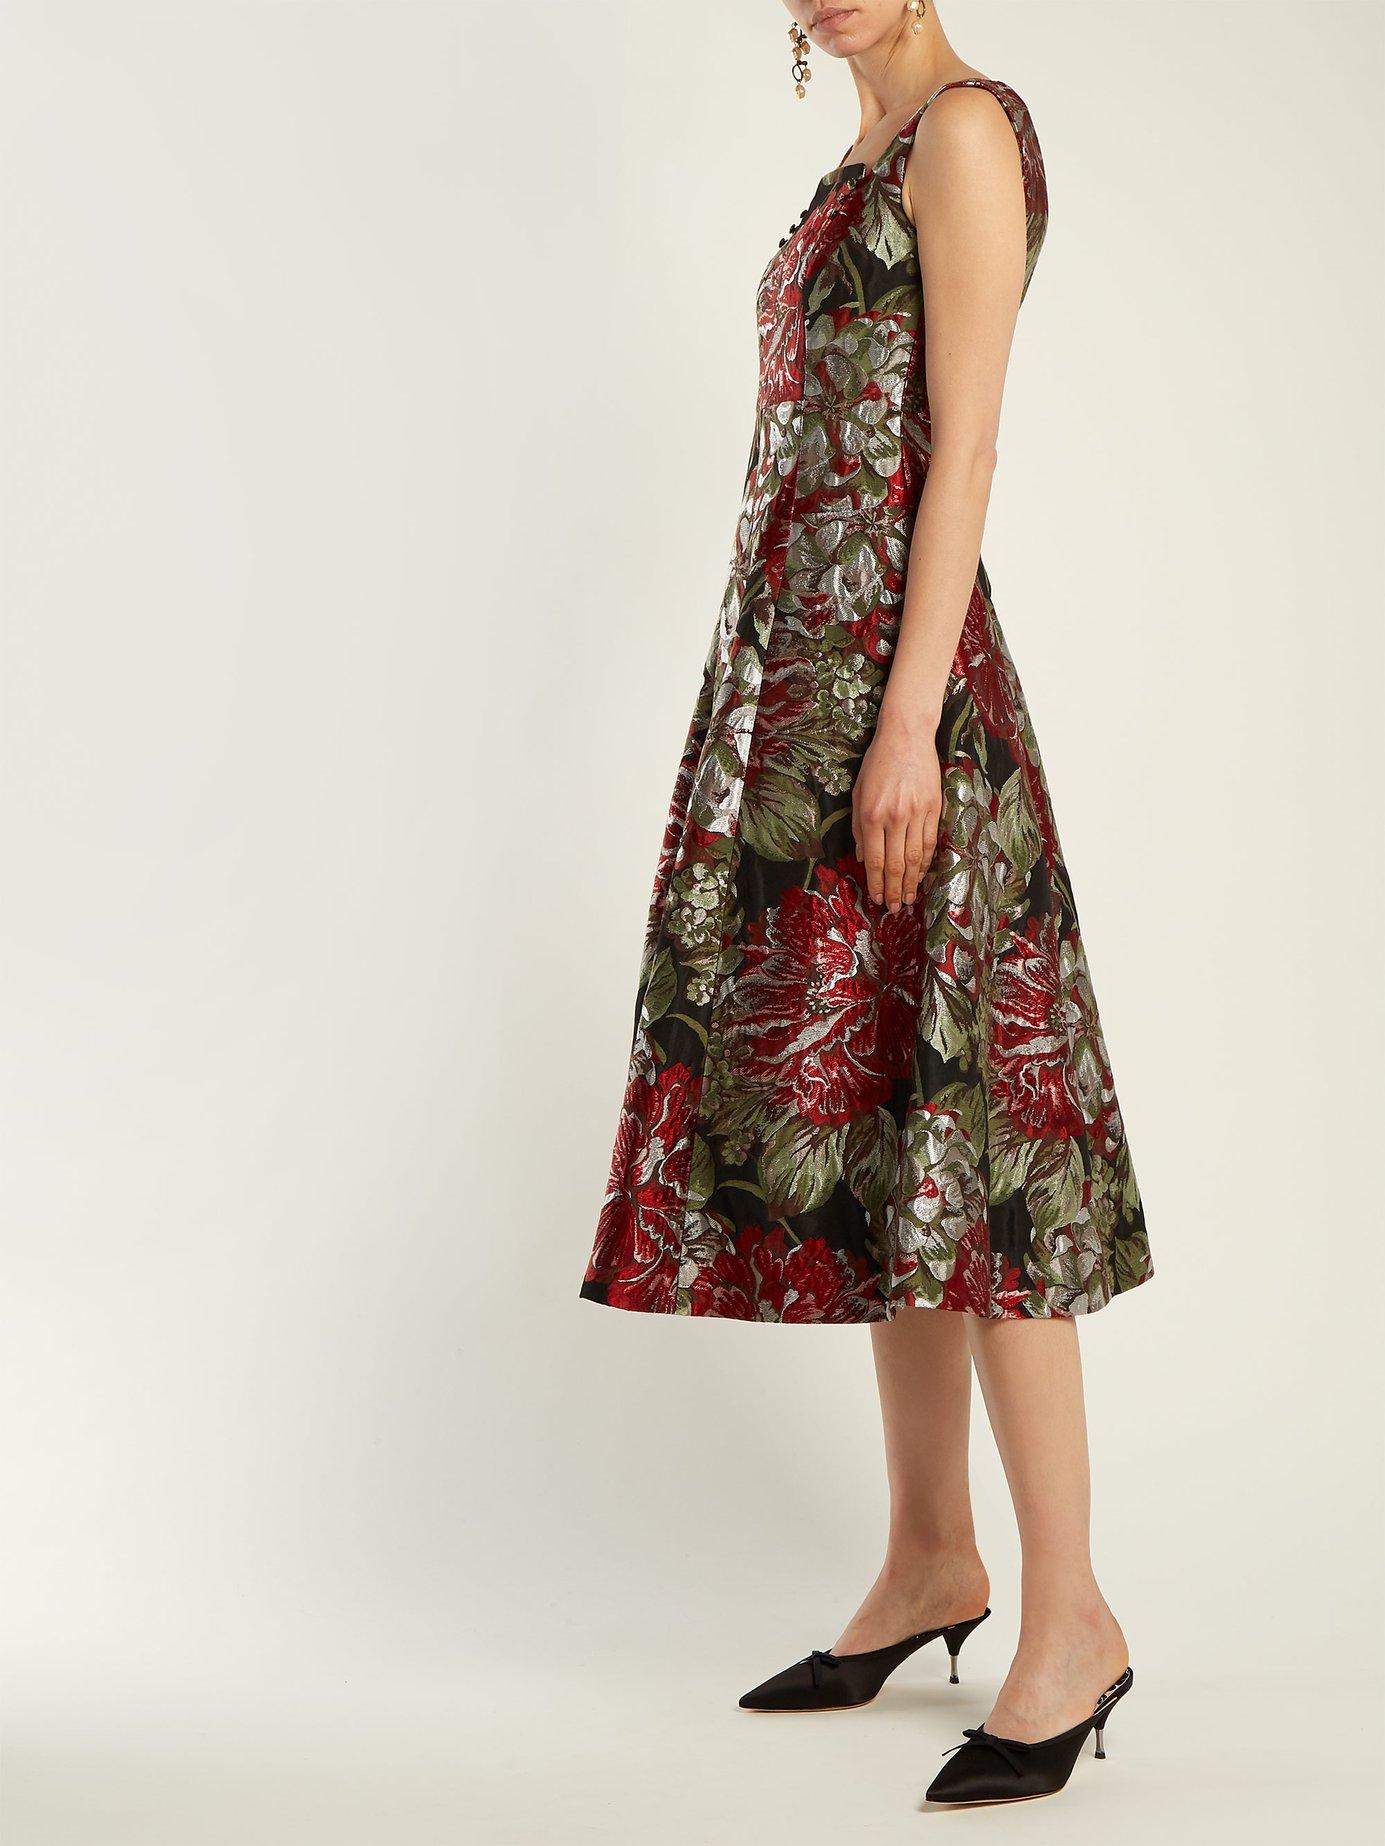 Polly flower-jacquard dress by Erdem